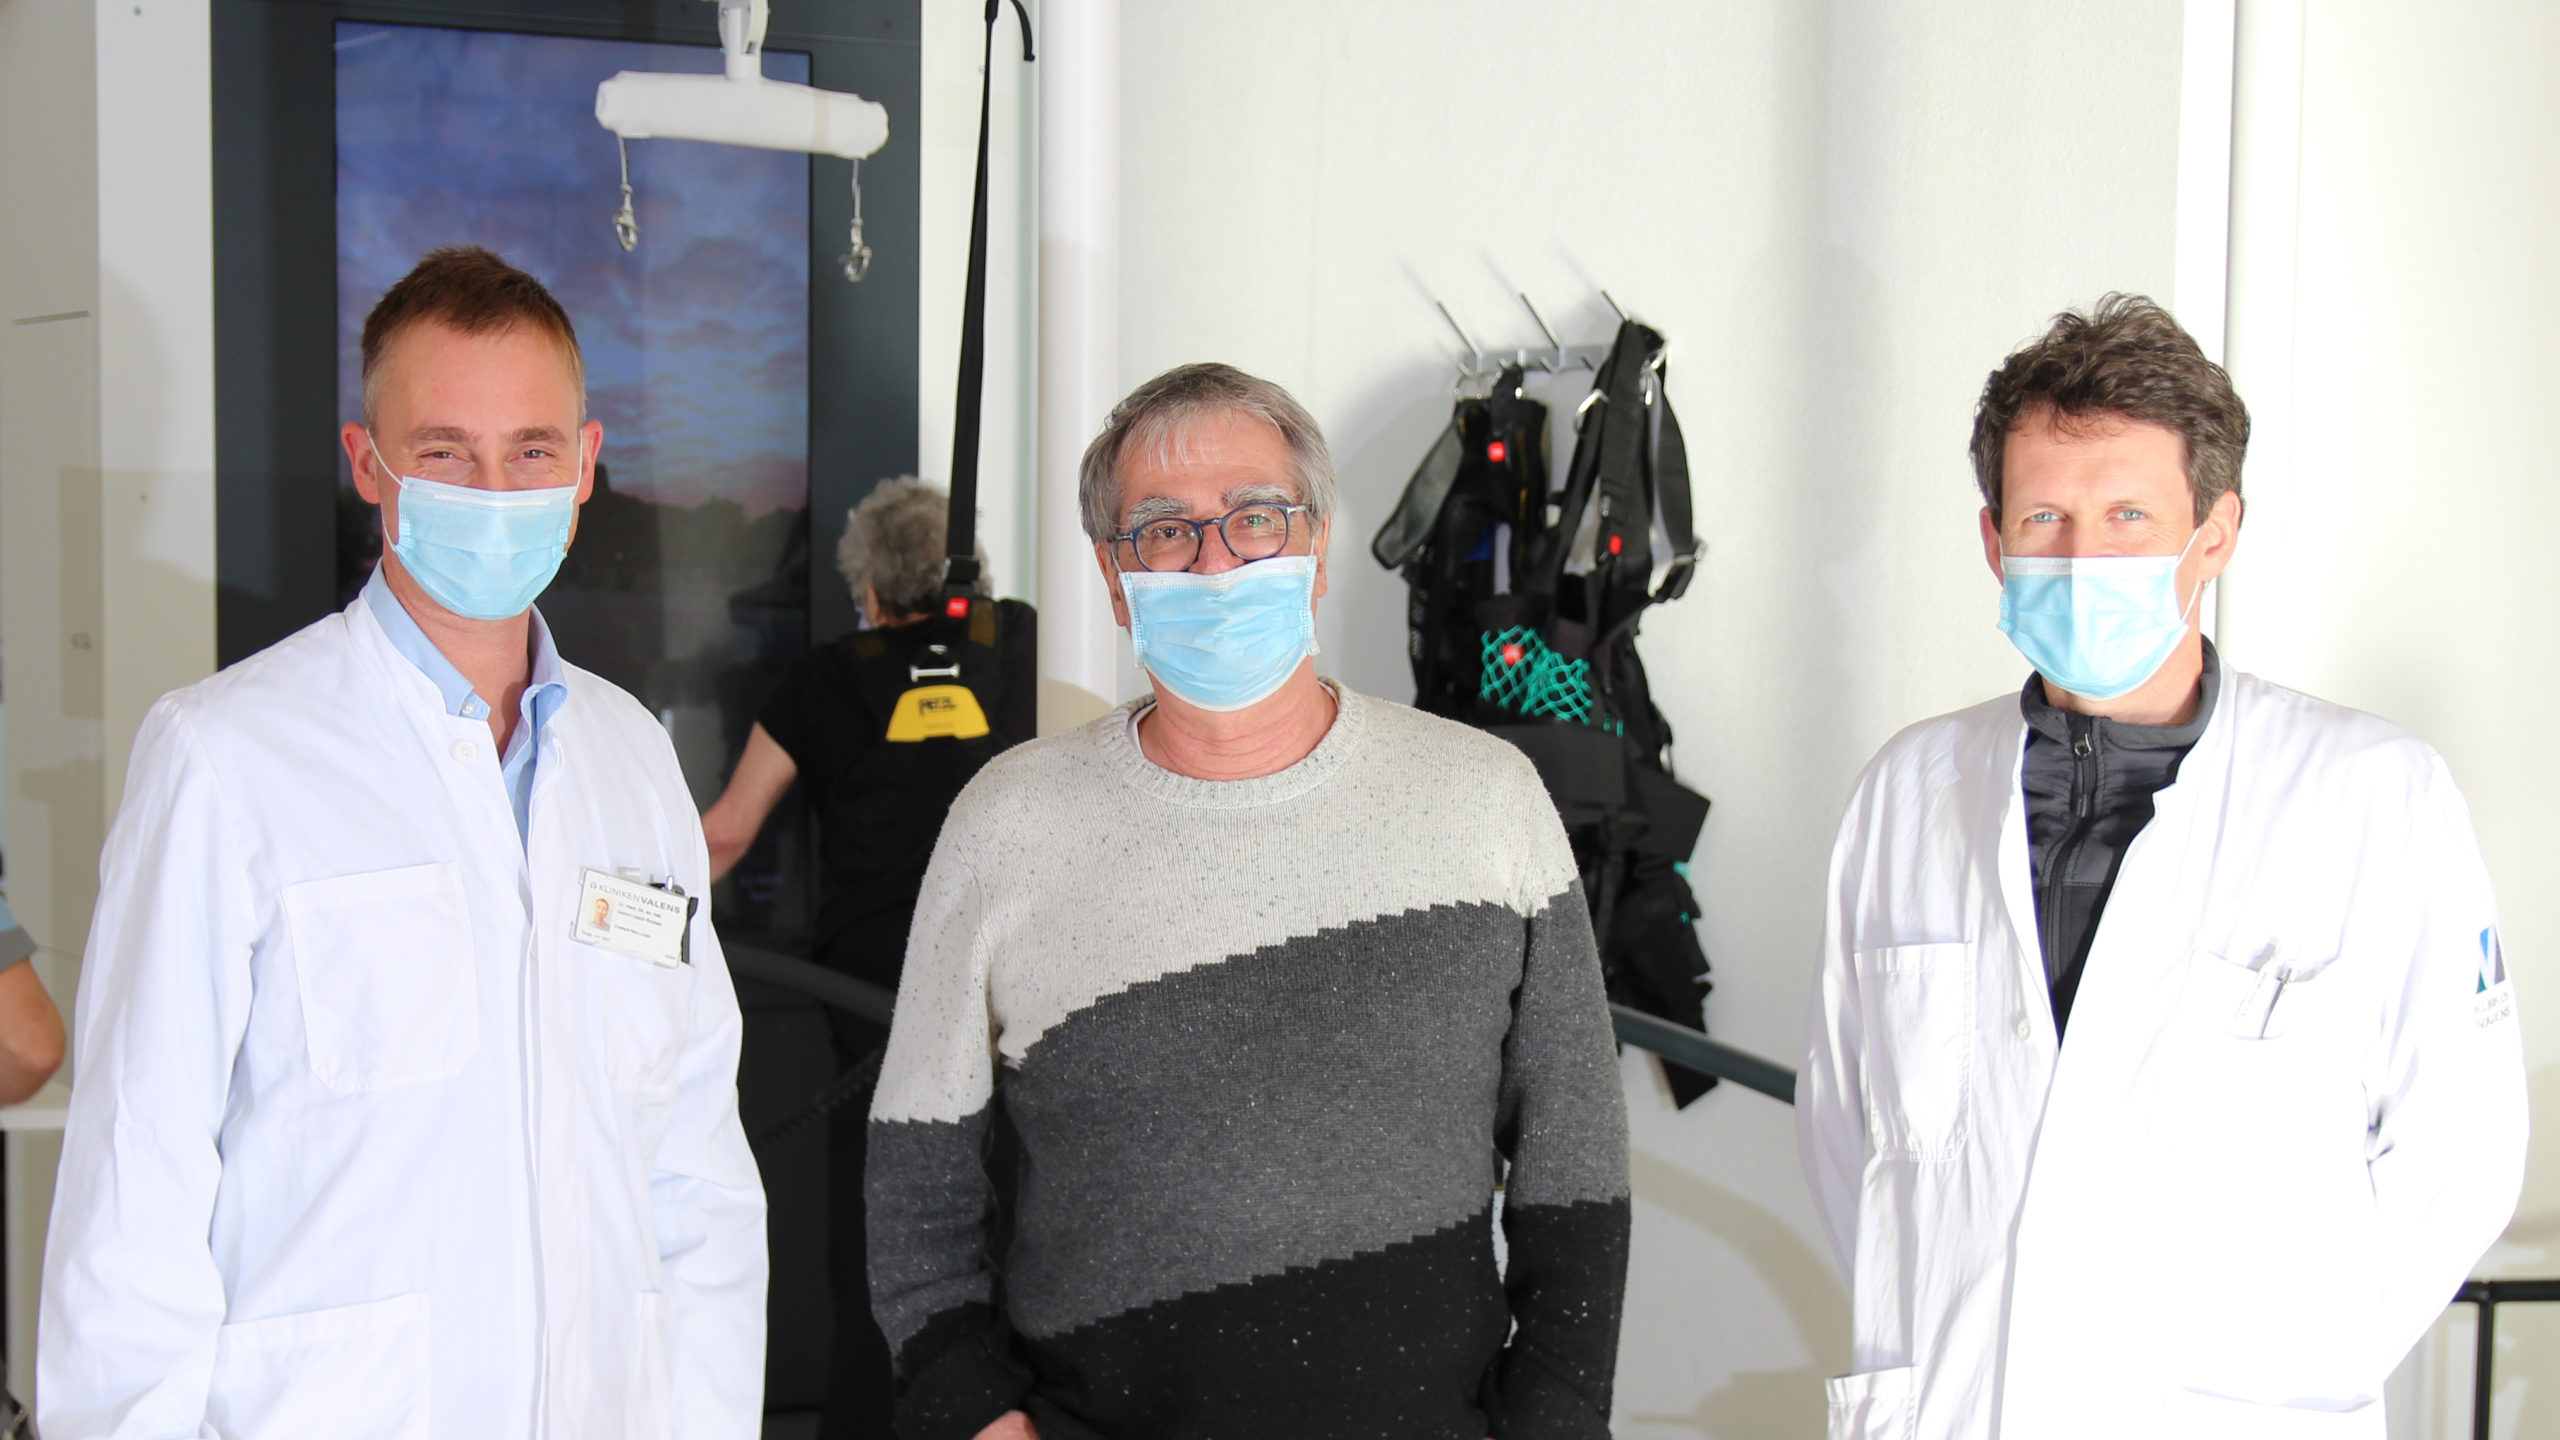 Parkinson-Forschungsprojekt: Ärzte vor C-Mill